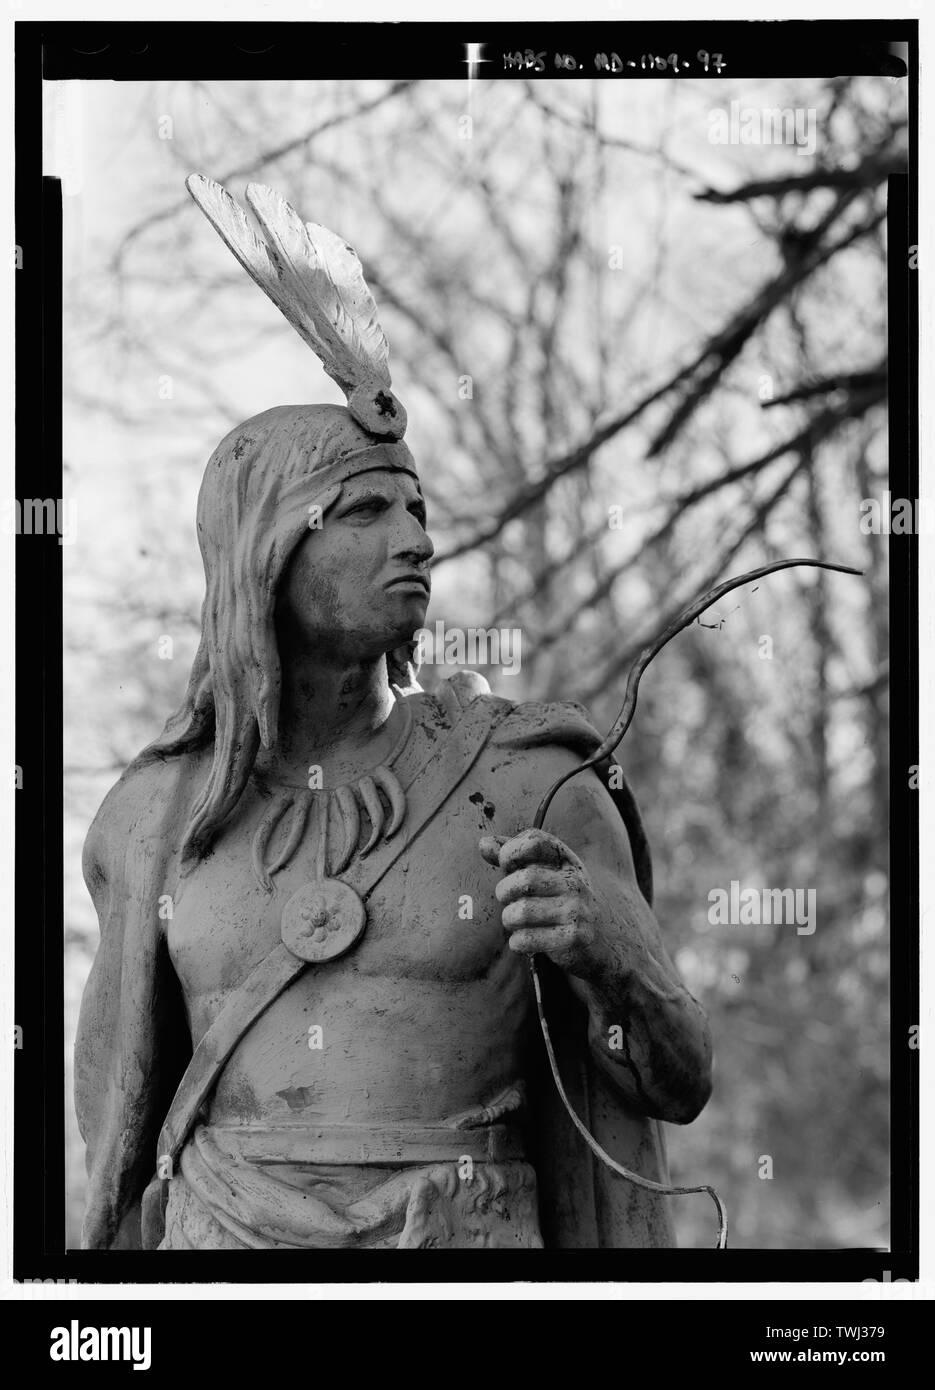 Hiawatha Black and White Stock Photos & Images - Alamy